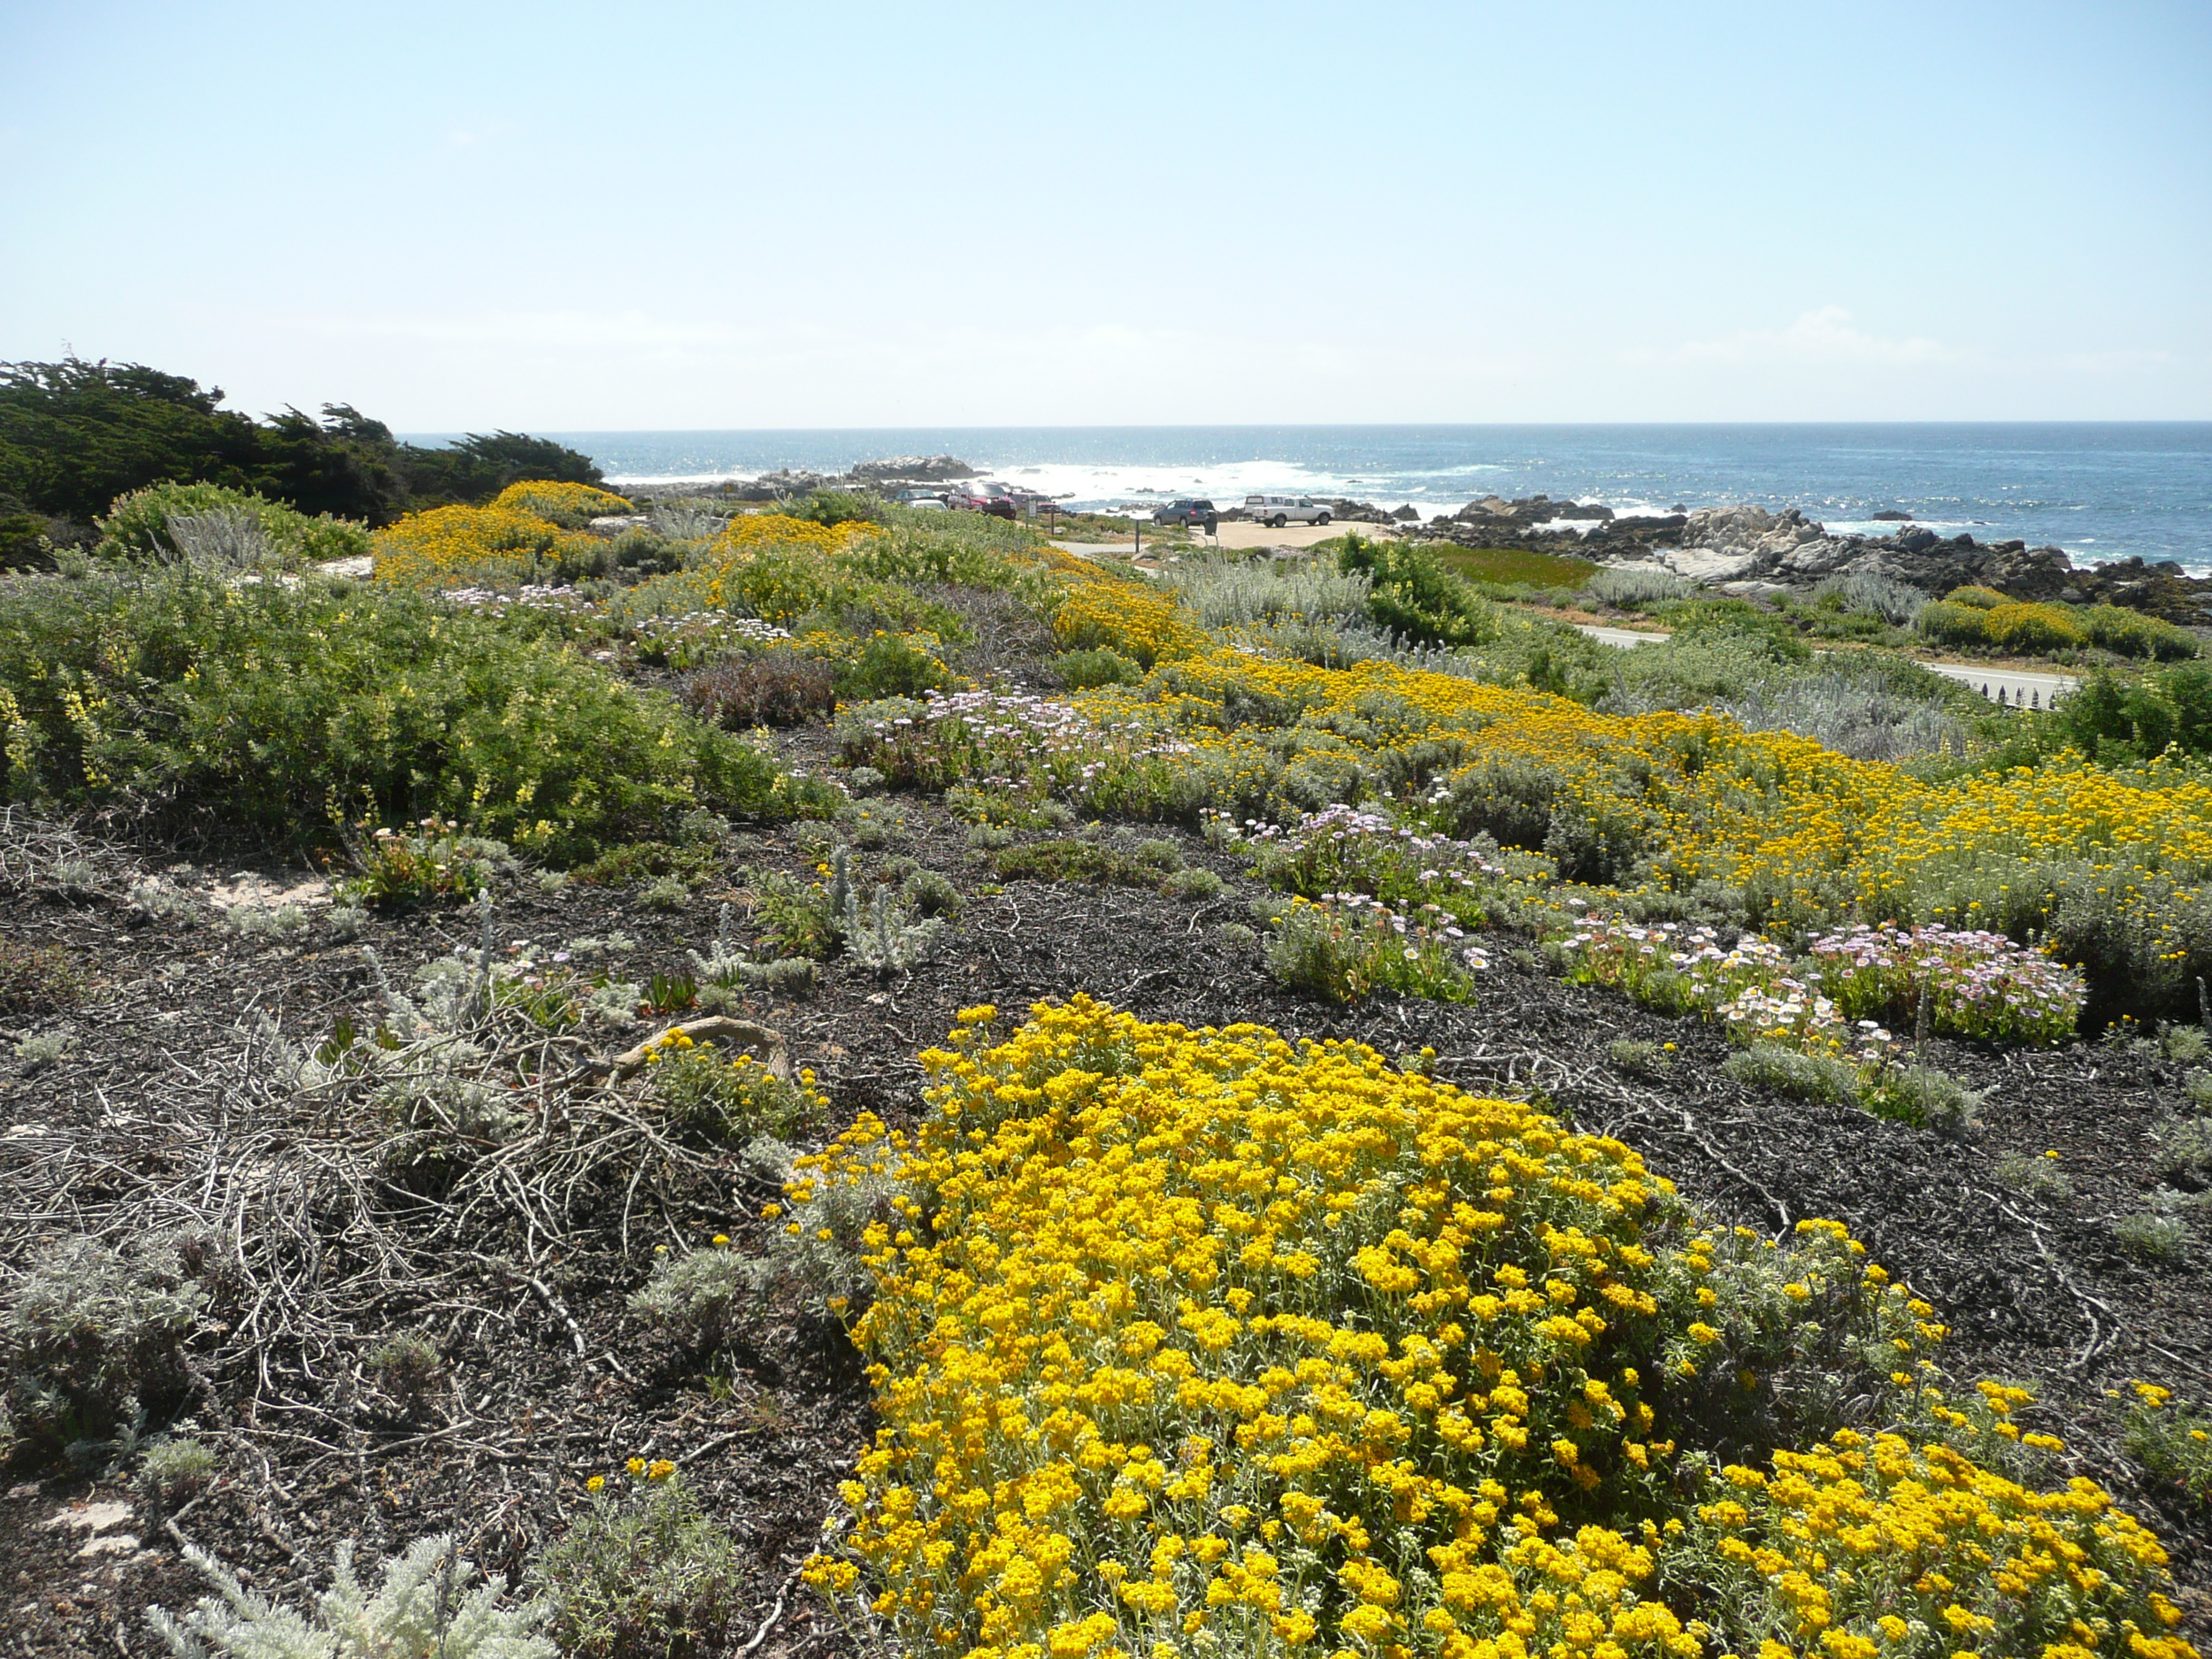 Pacific+Grove+Dune+Restoration+2+-+credit+John+Wandke.jpg